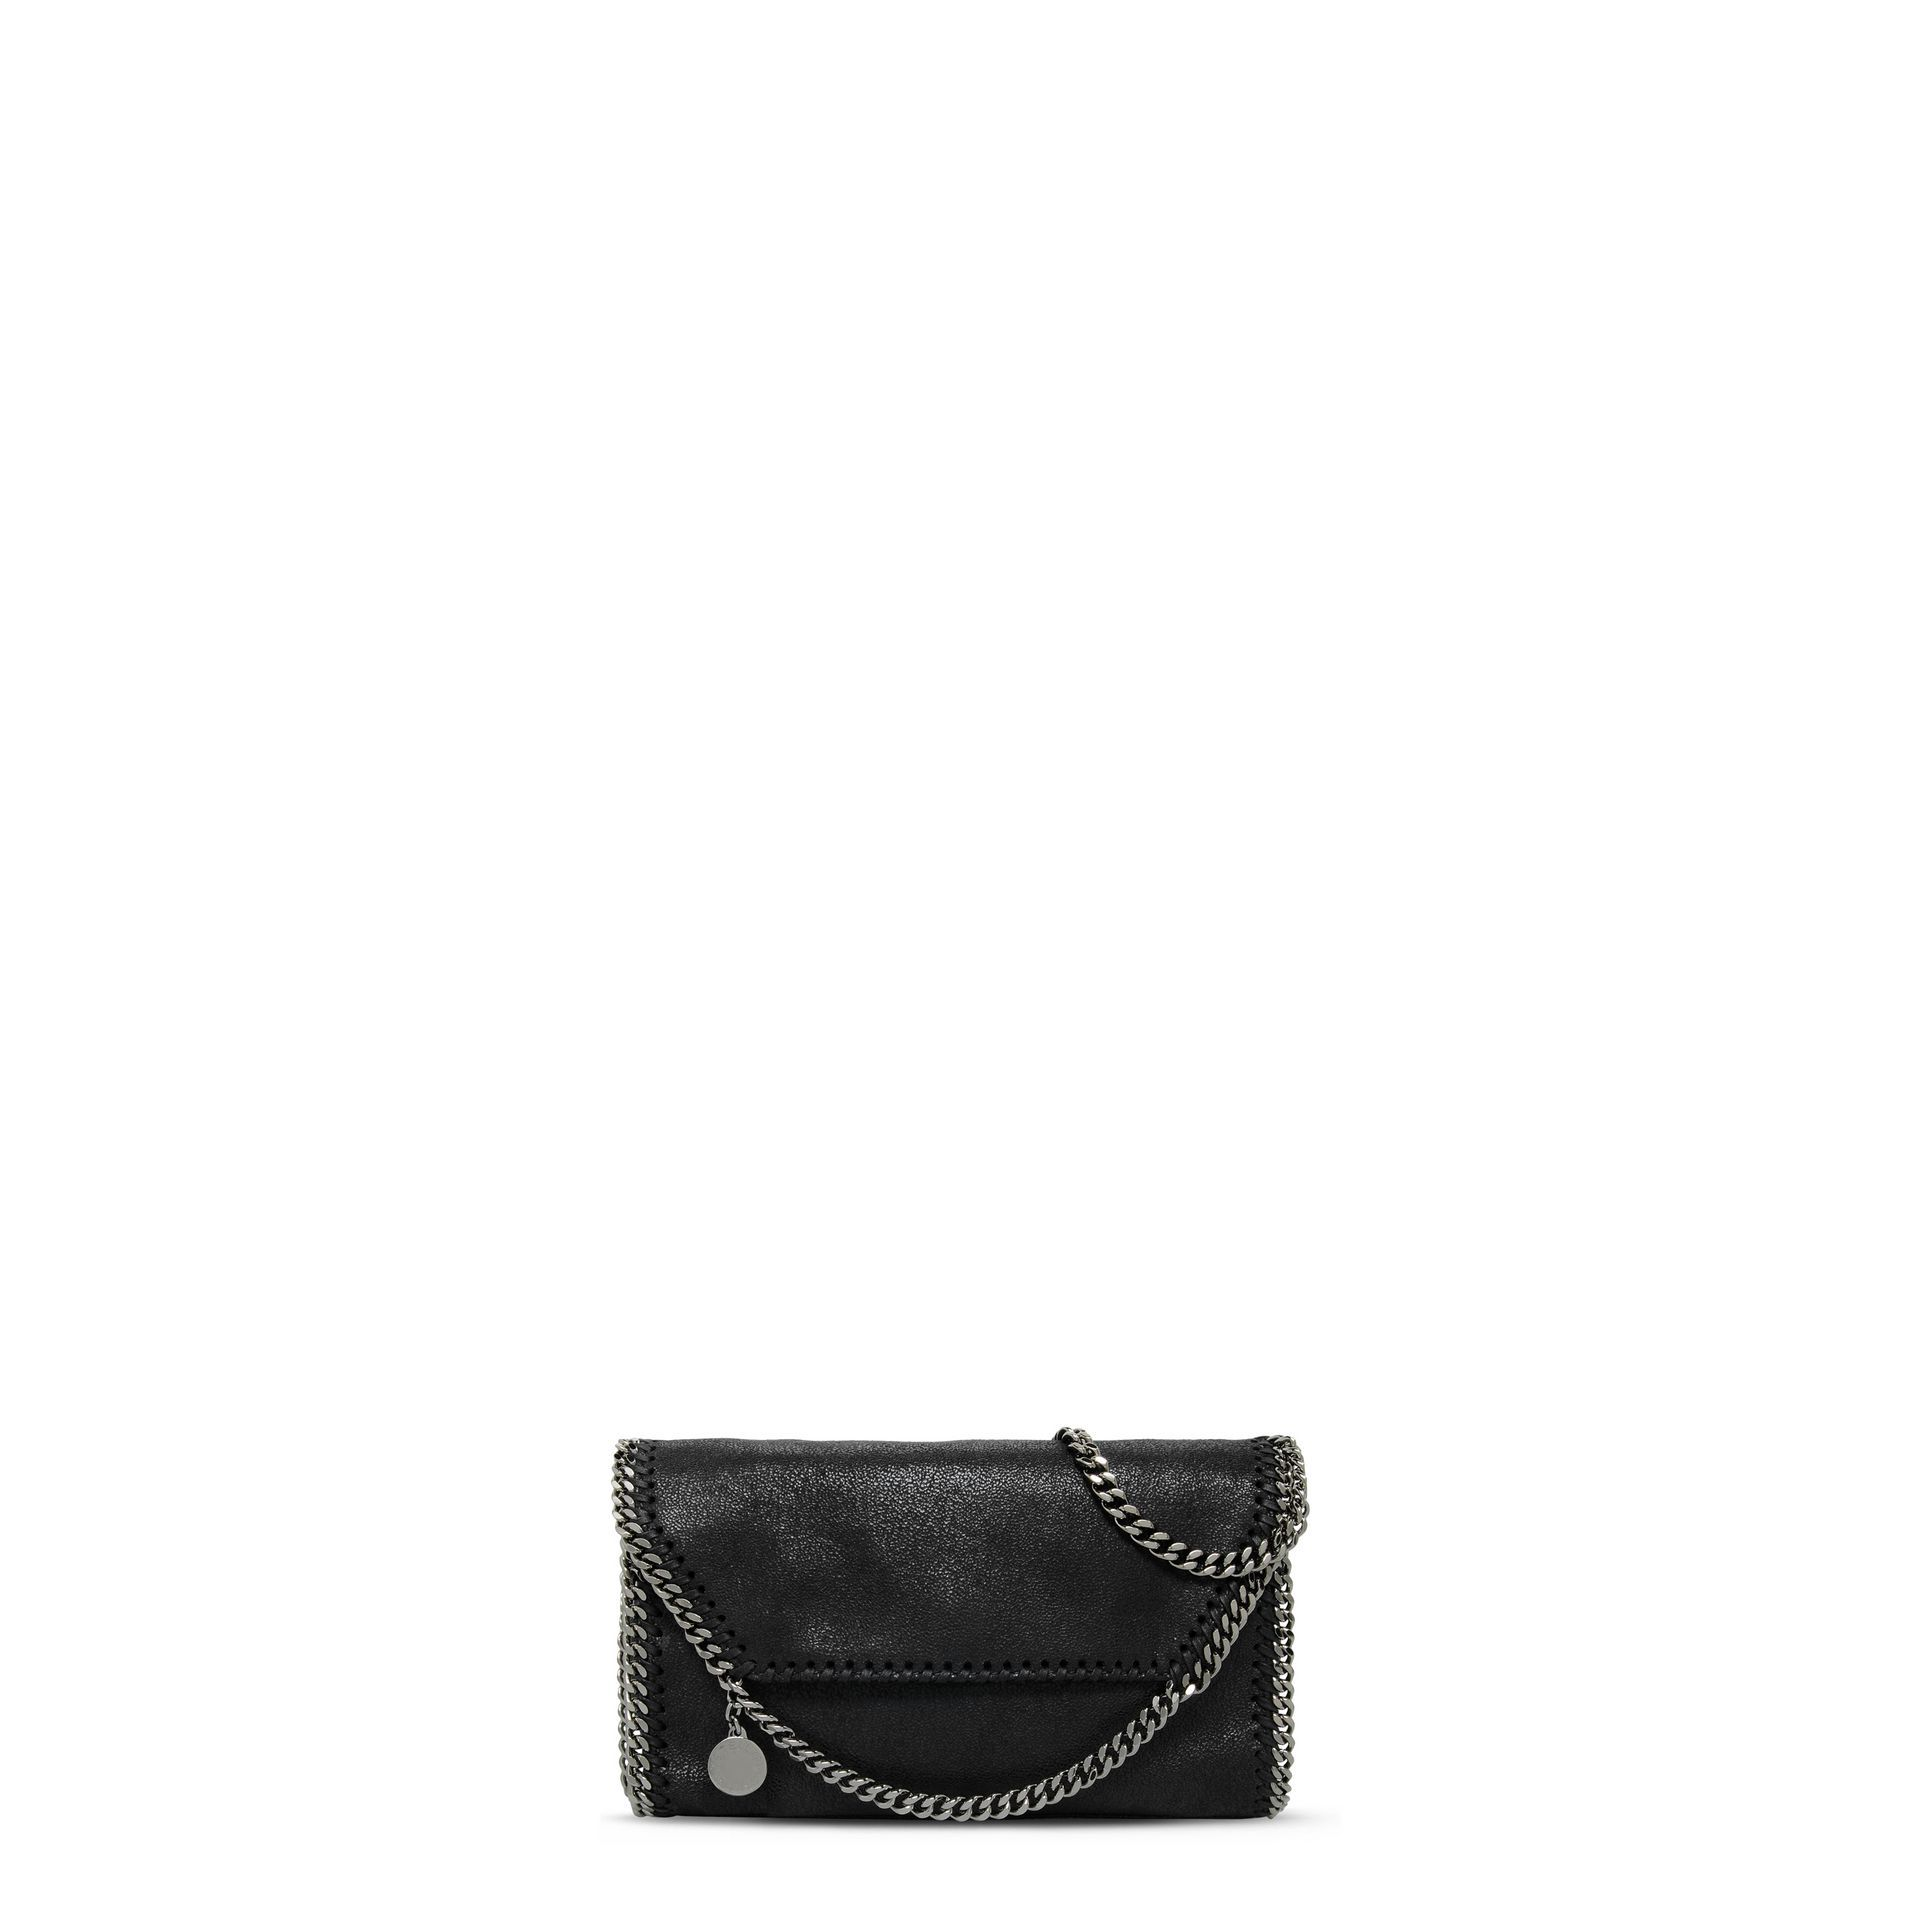 Black Falabella Shaggy Deer Mini Bag - STELLA MCCARTNEY  f047aecca52ec